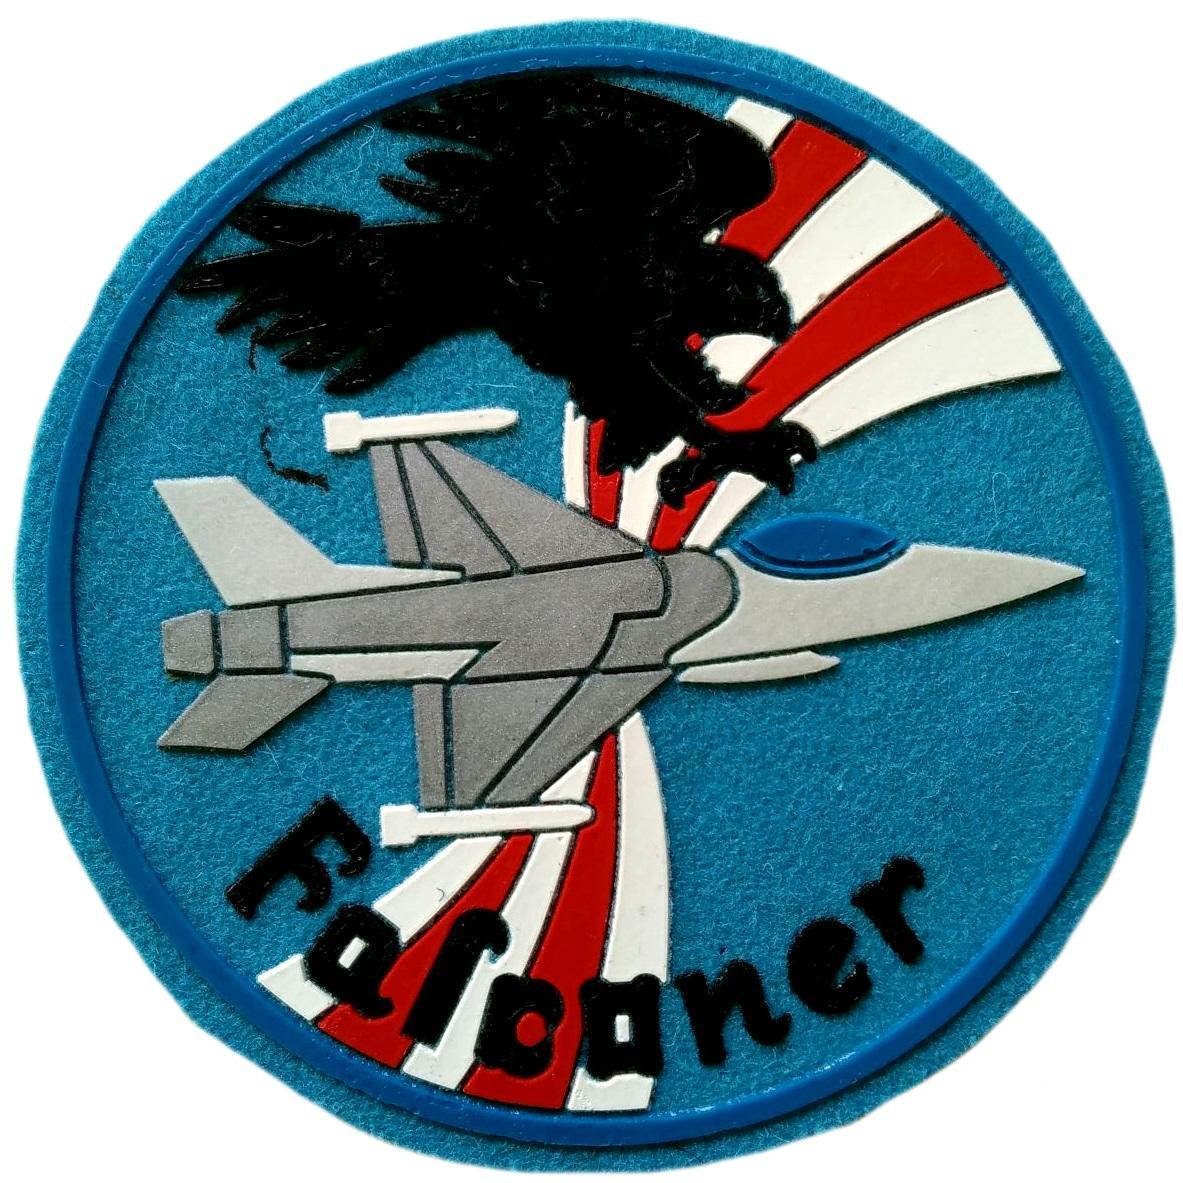 Ejército del aire falcaner parche insignia emblema distintivo